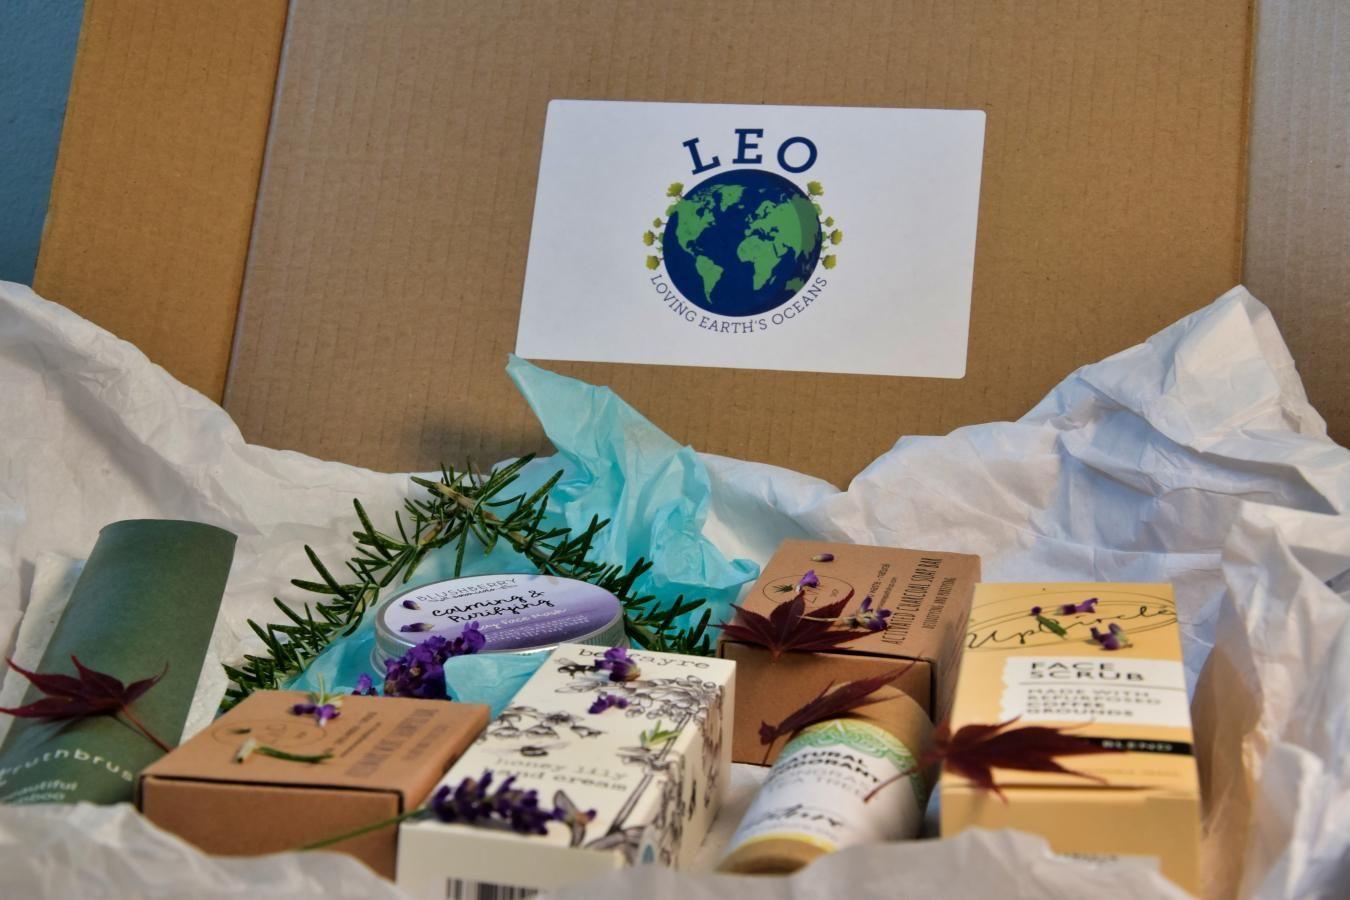 Leo's Box